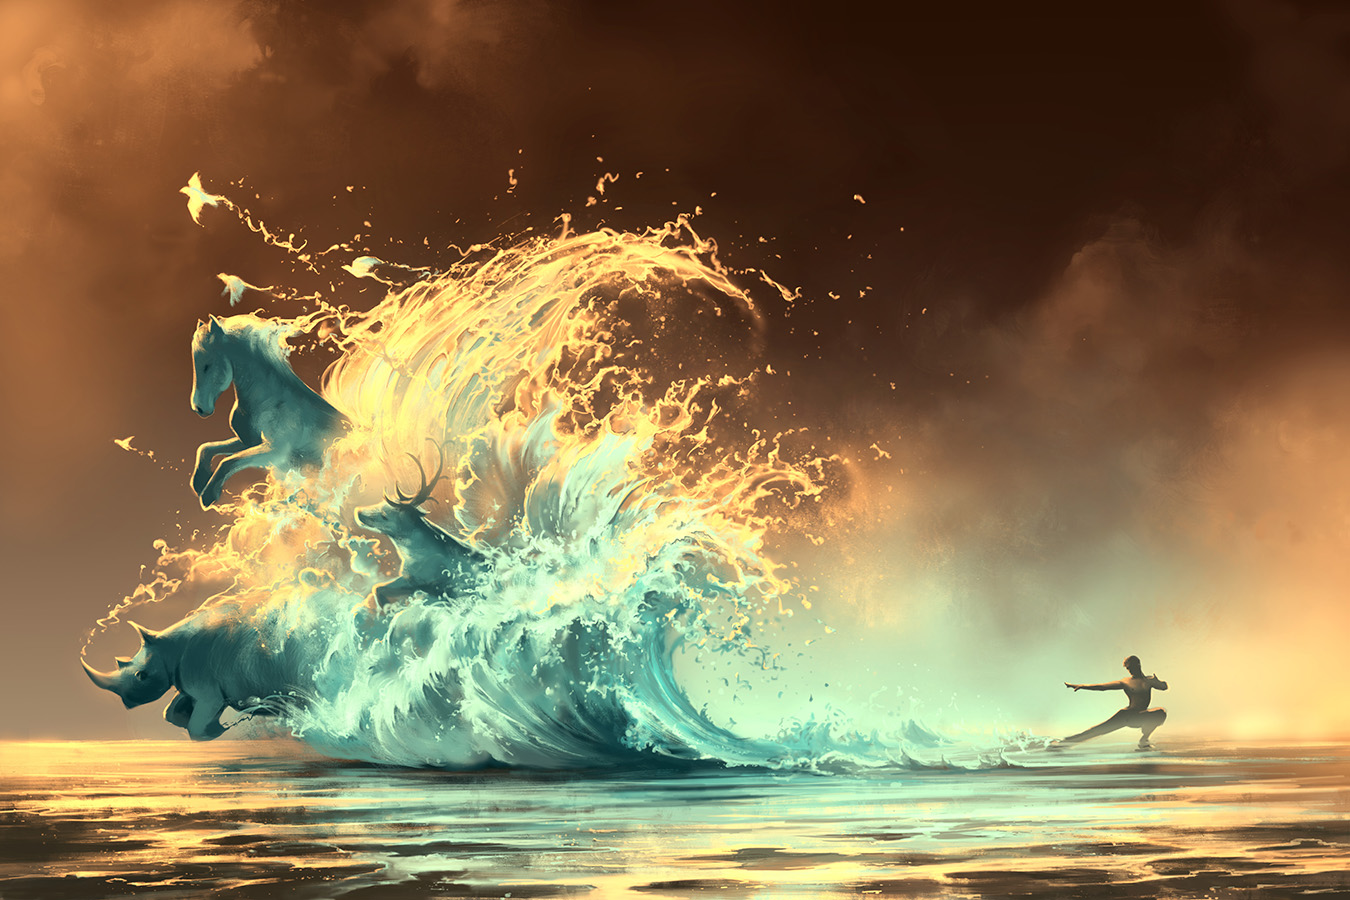 Mana Tide by AquaSixio